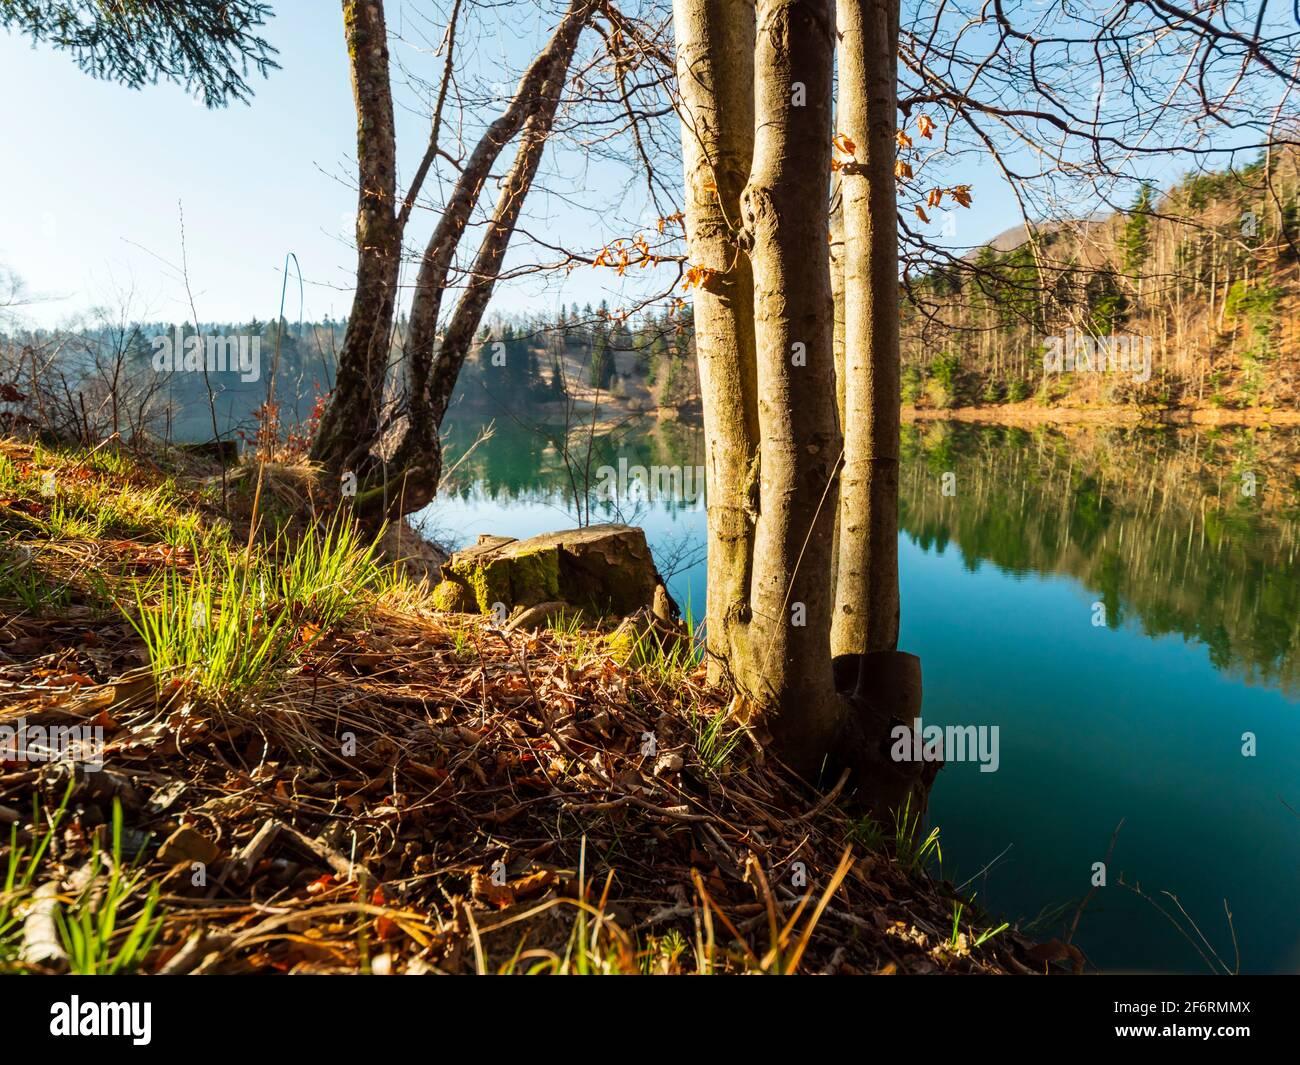 Stump picturesque peaceful tranquility Lokve lake in Croatia Europe Stock Photo